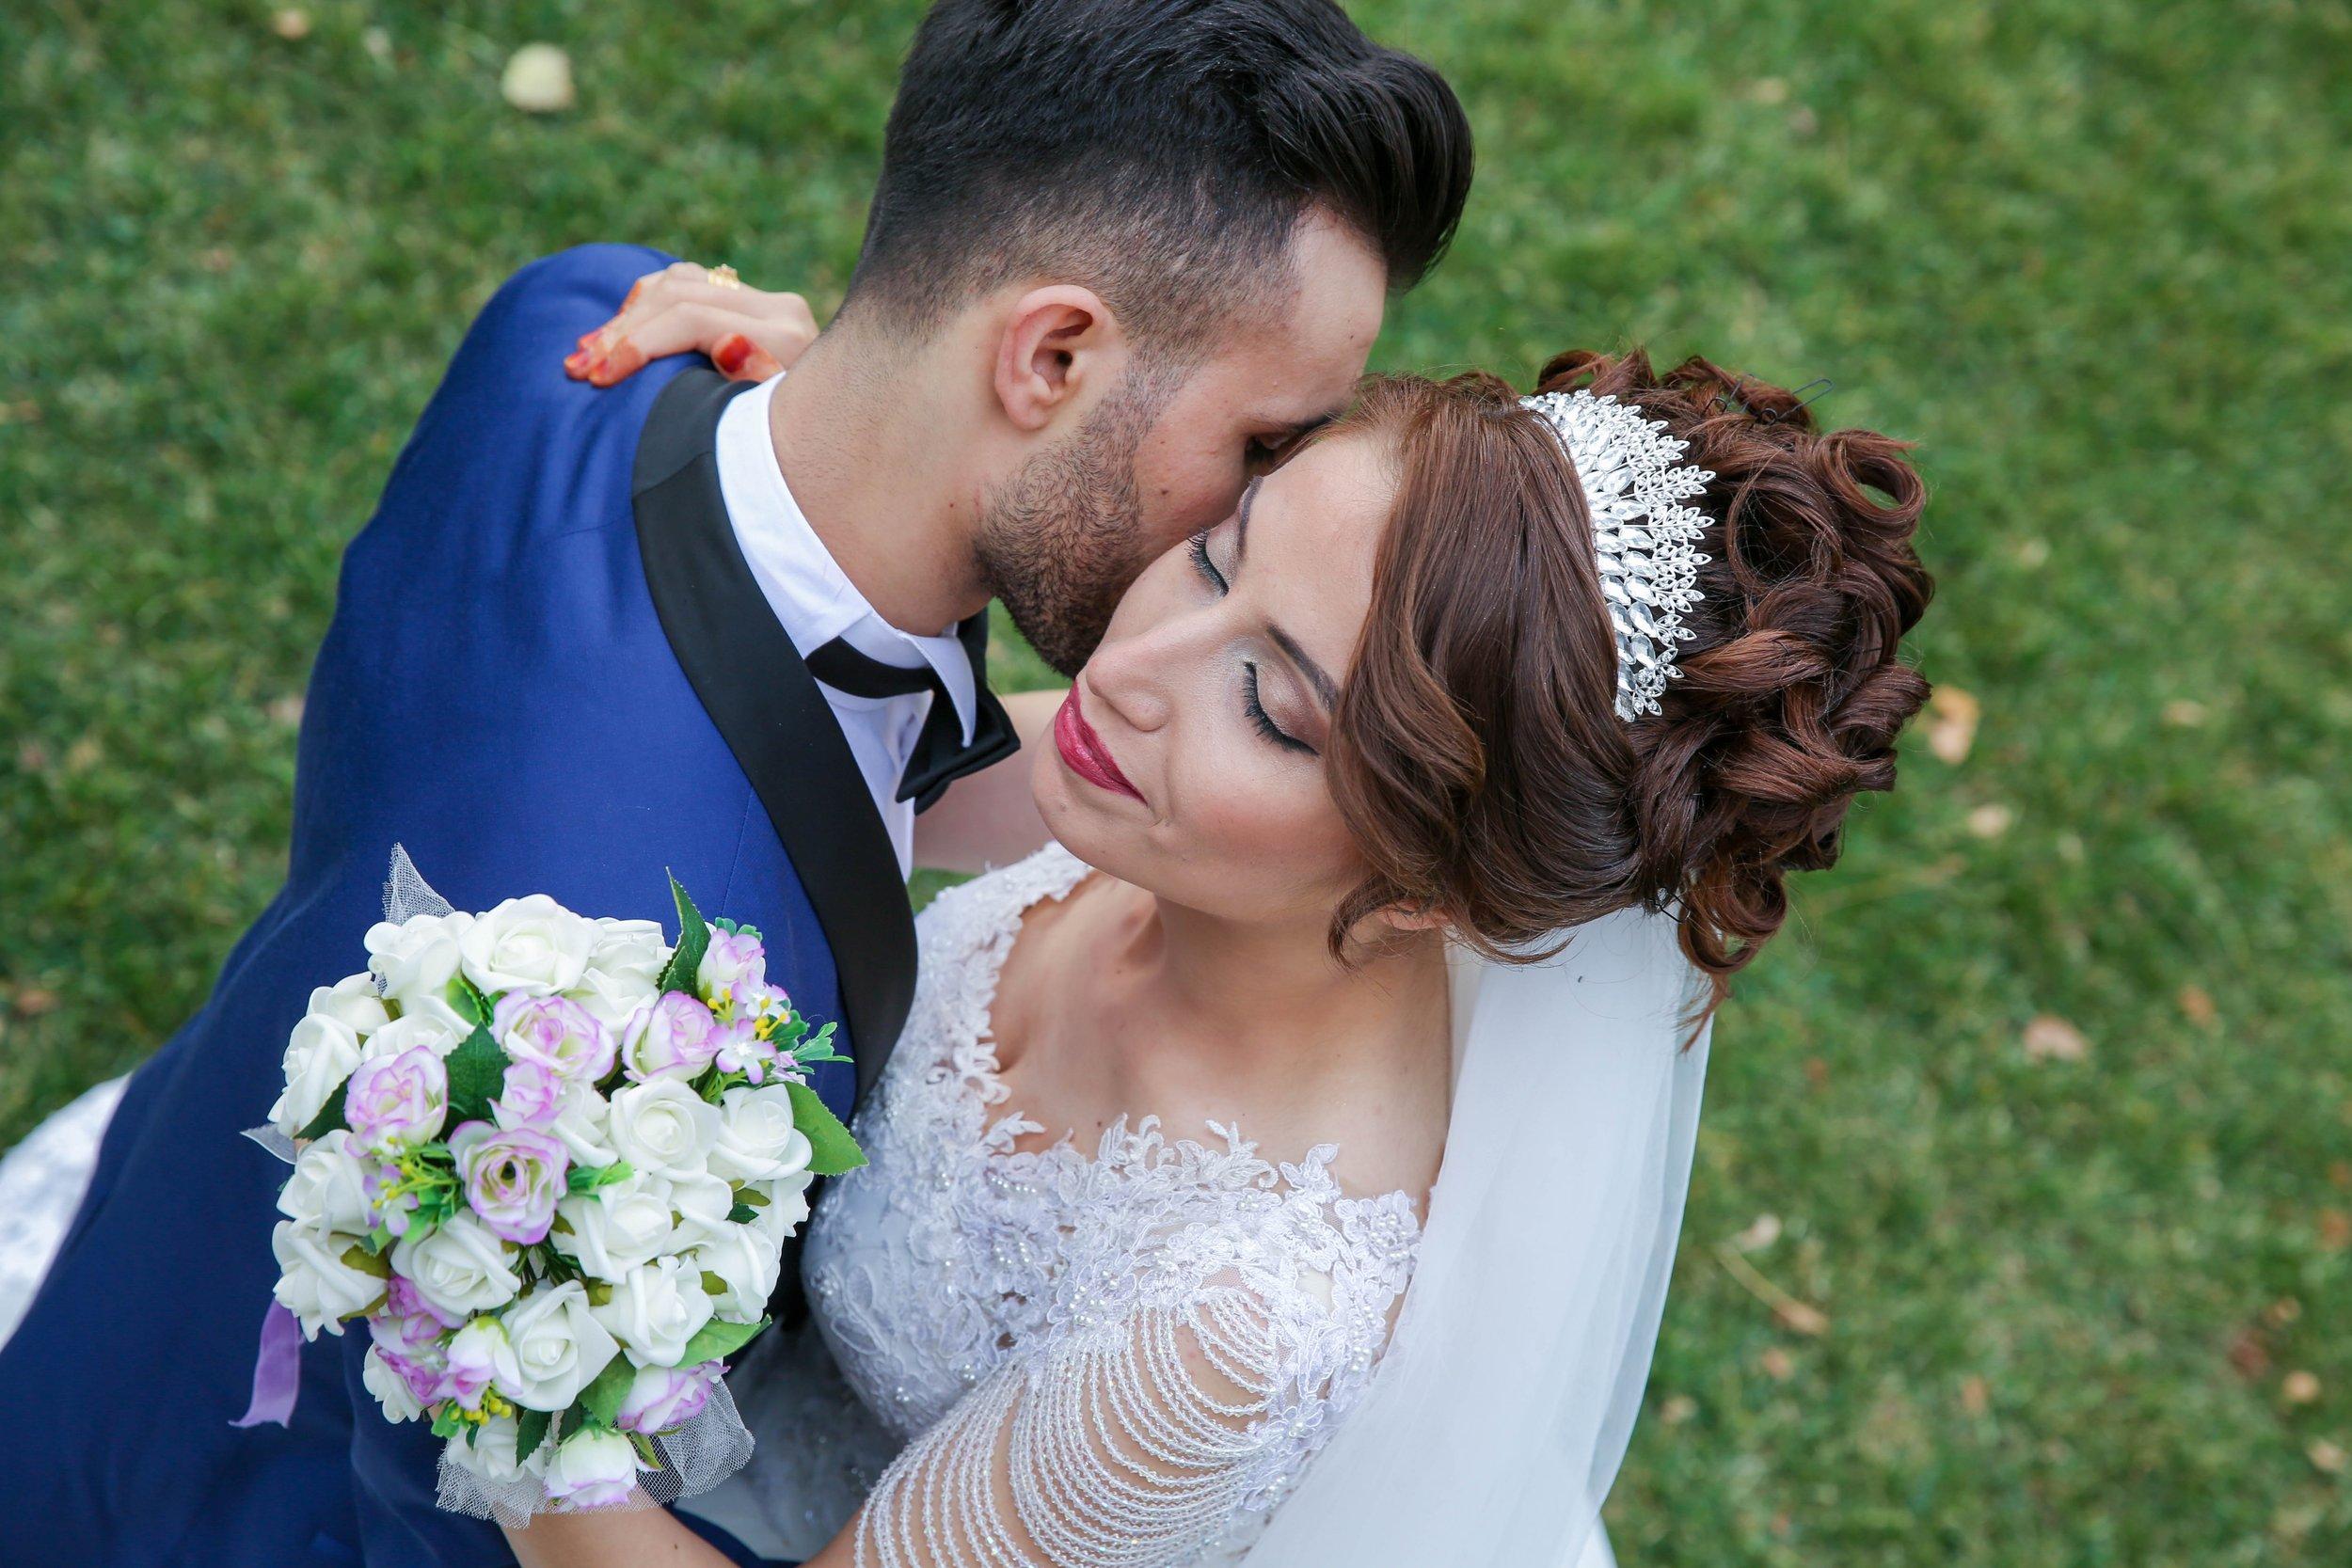 bouquet-bridal-bride-247958.jpg